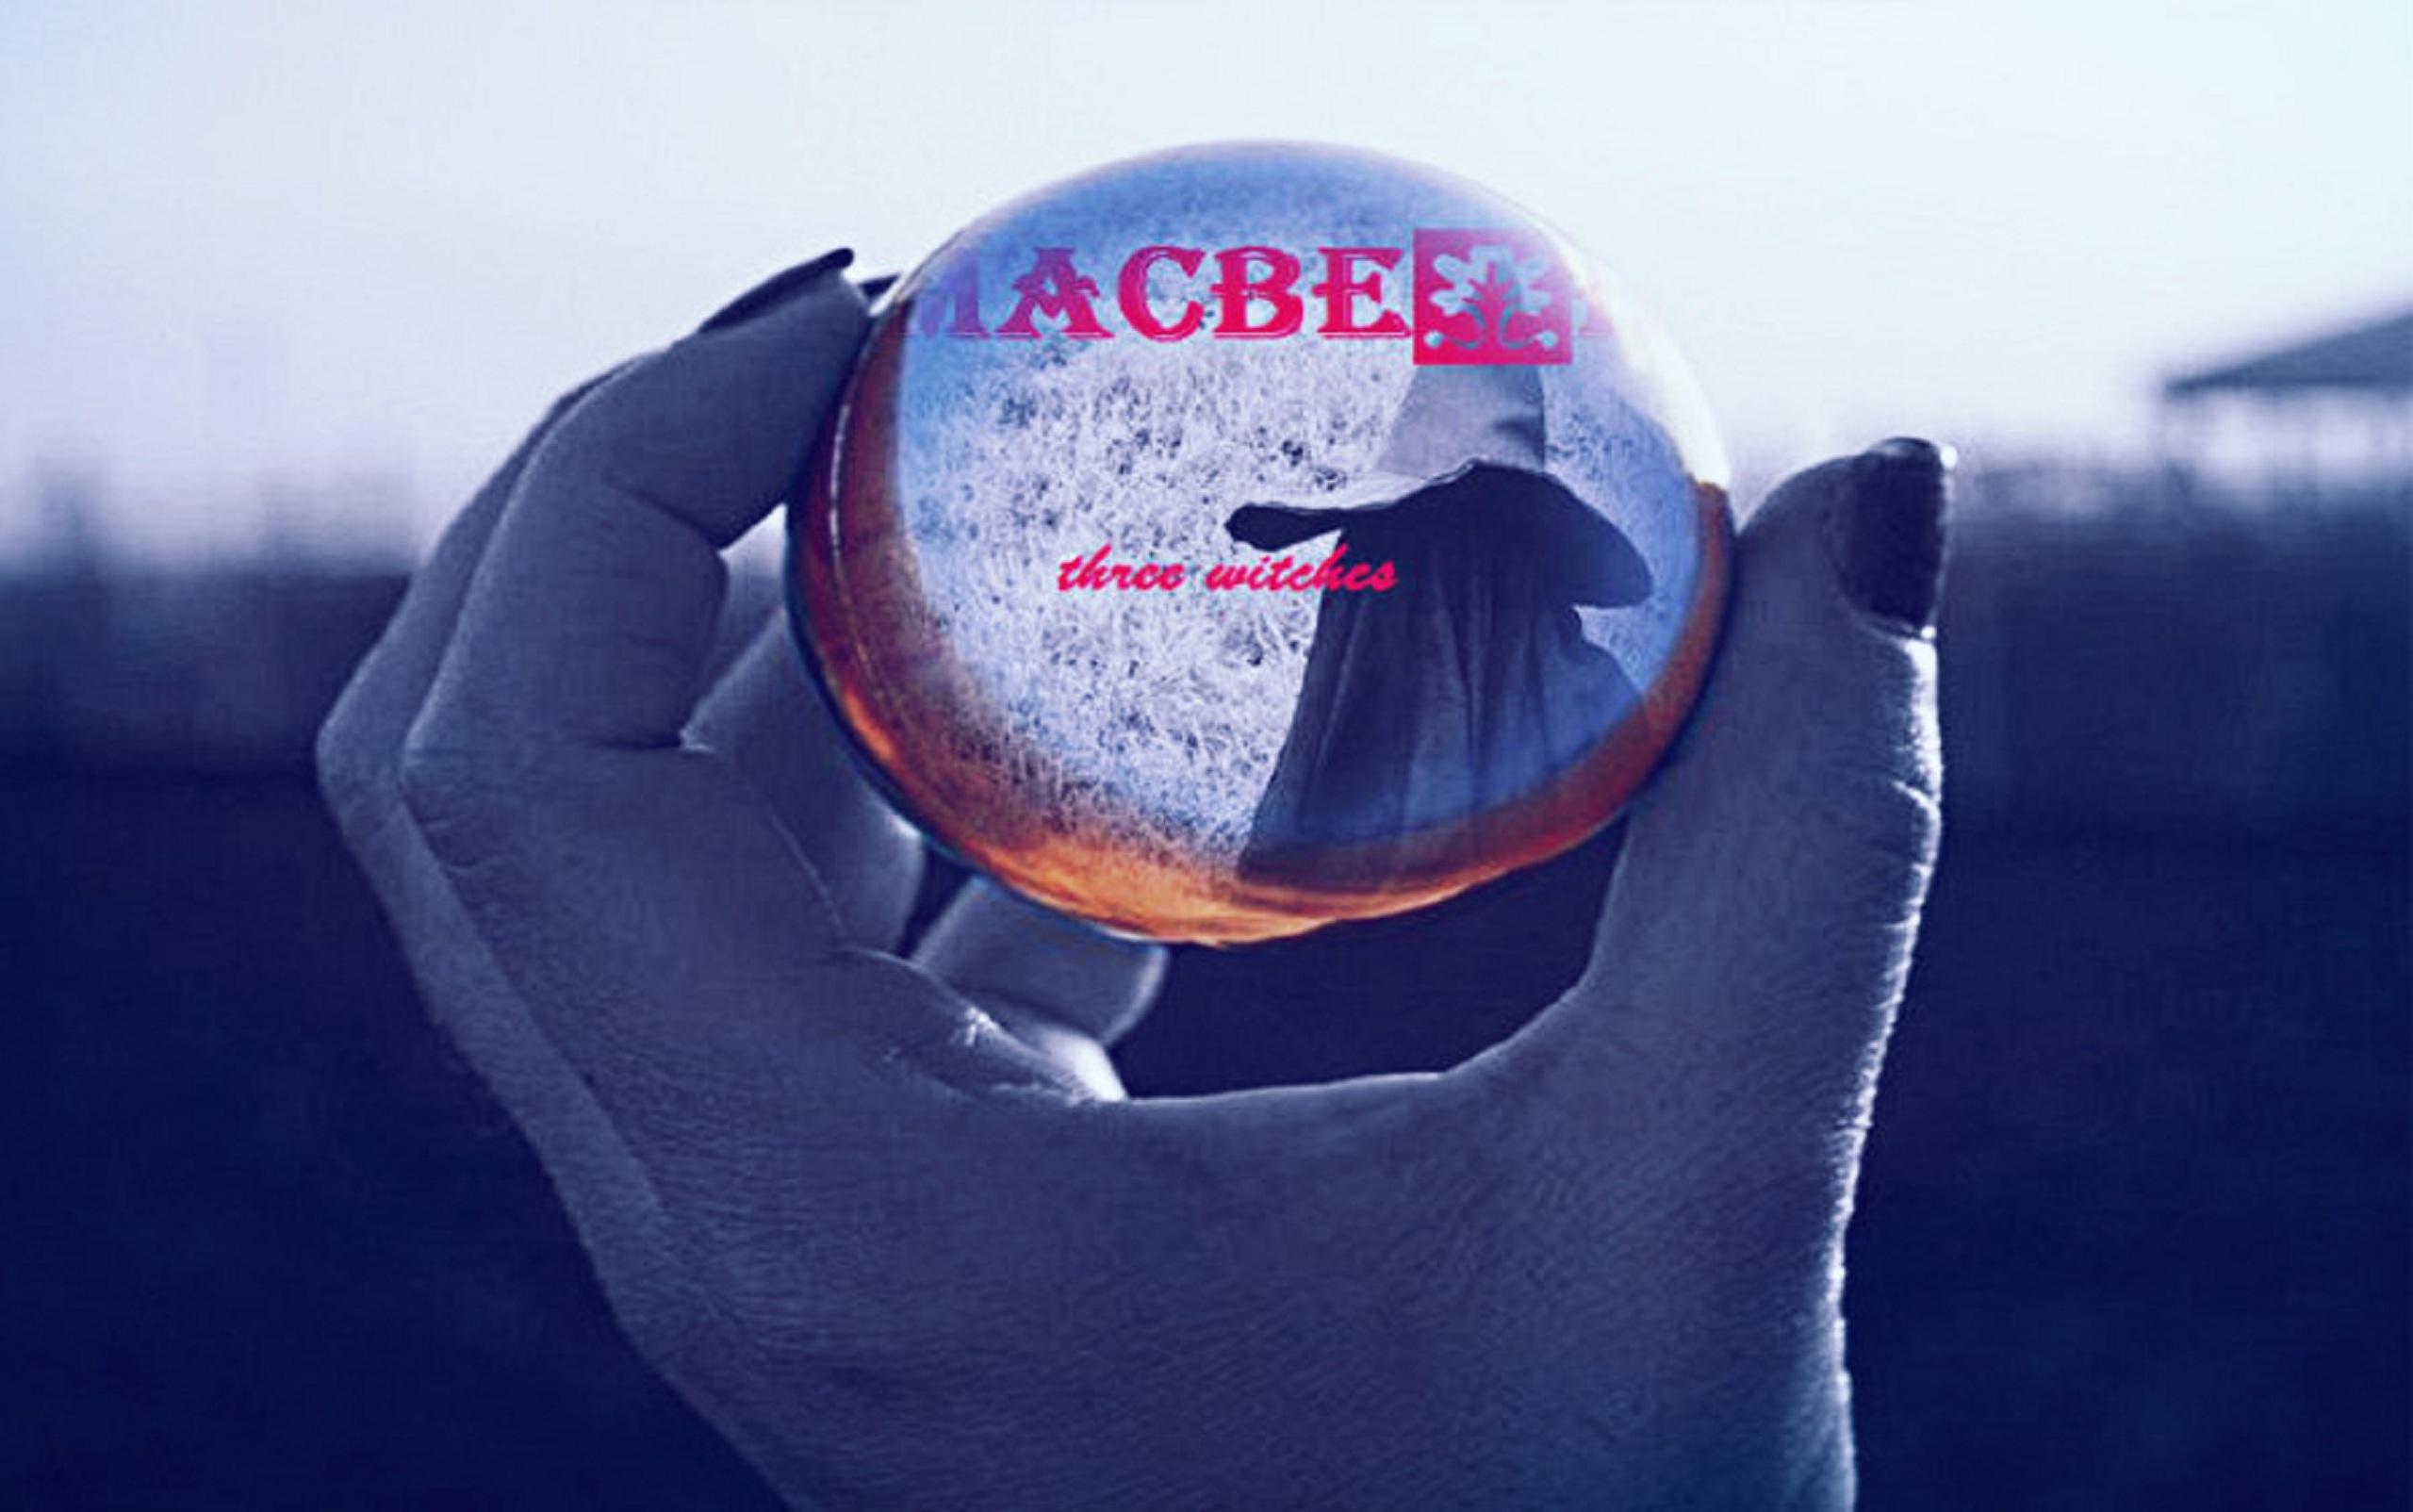 Macbeth's final realization